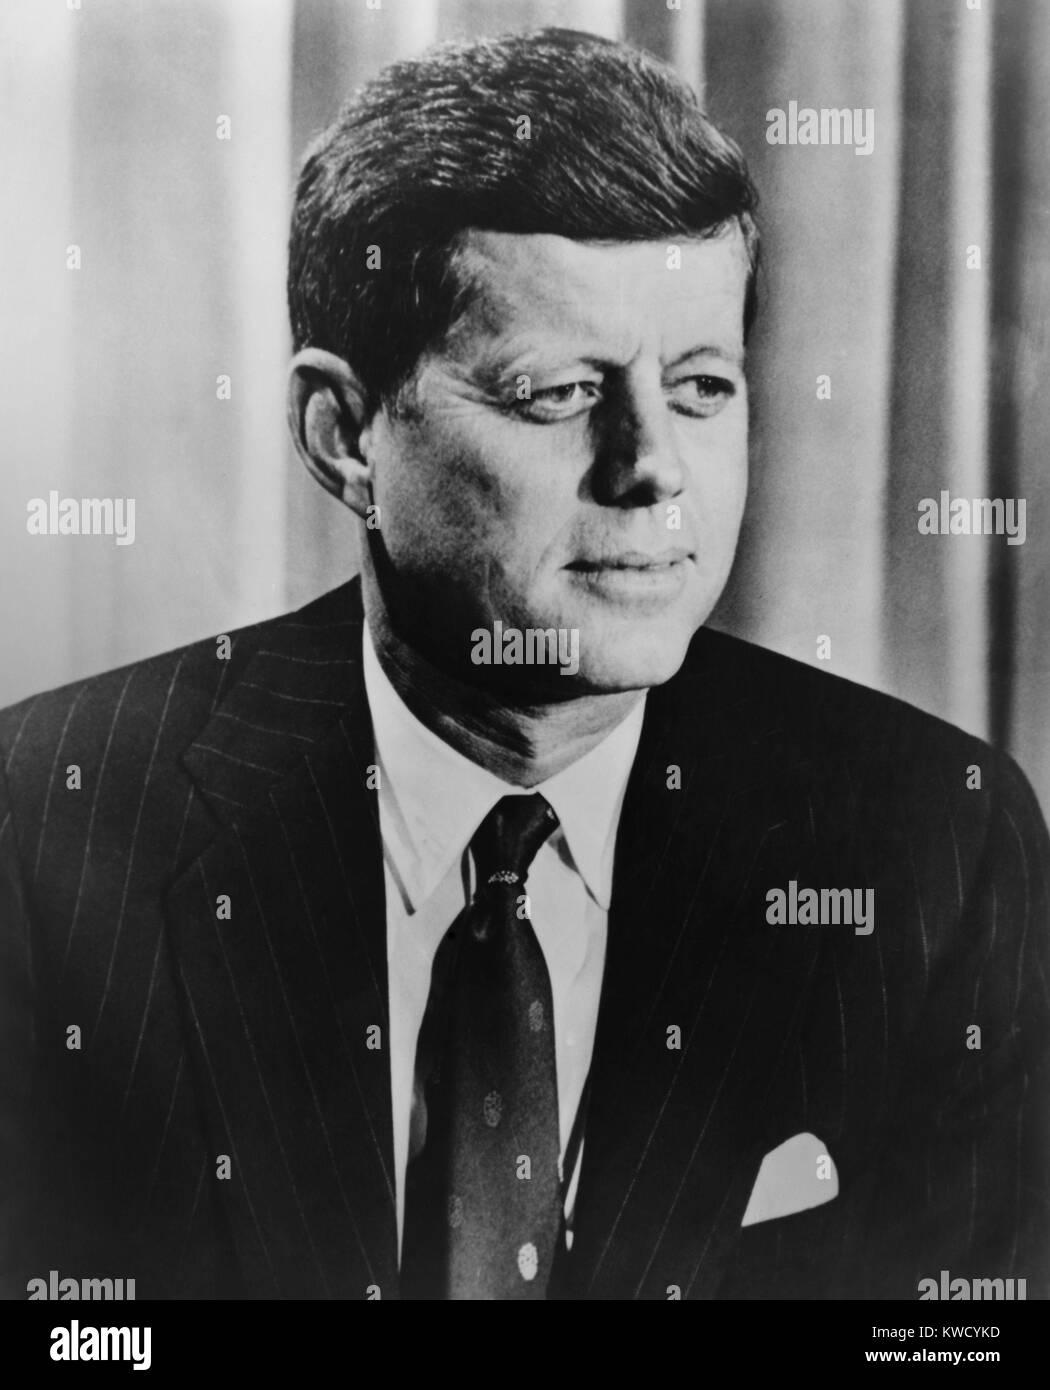 Präsident John F. Kennedy, C. 1960-1963. (BSLOC_2017_2_195) Stockbild